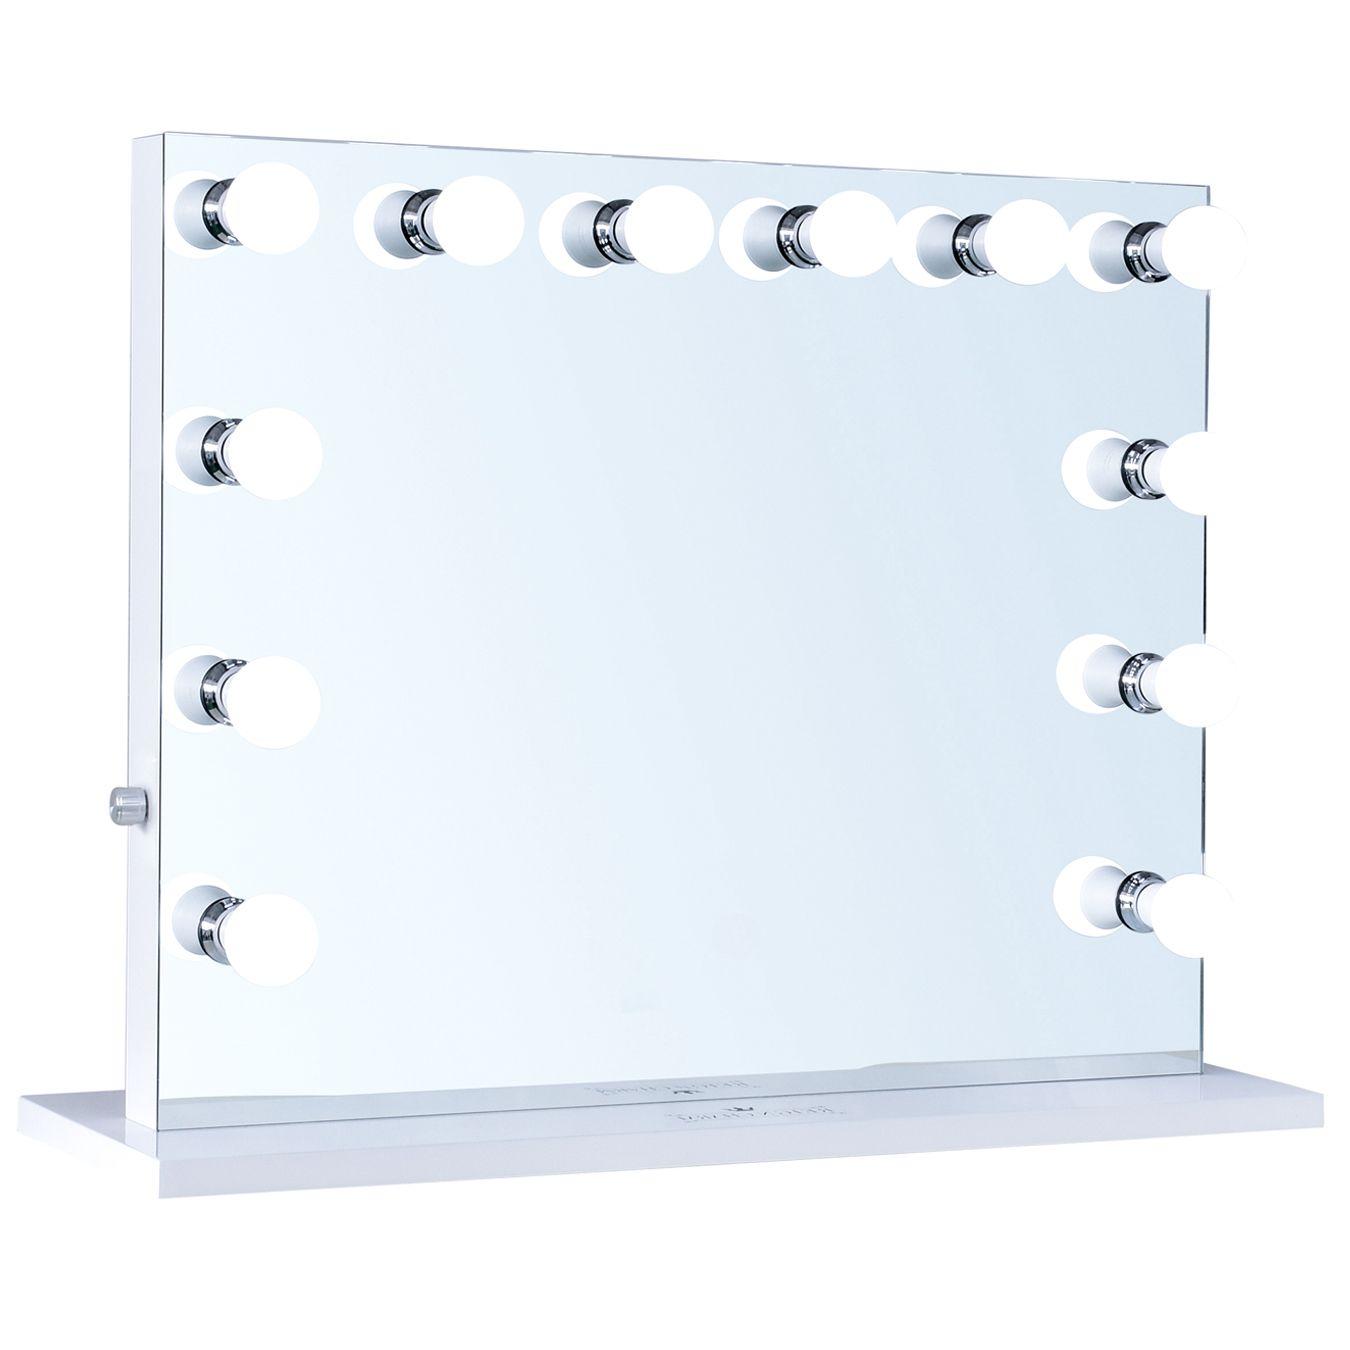 Reigncharm Hollywood Vanity Mirror 12 Led Lights Dual Outlets Usb 32 W X 27 H Walmart Com Hollywood Vanity Mirror Vanity Mirror Hollywood Vanity